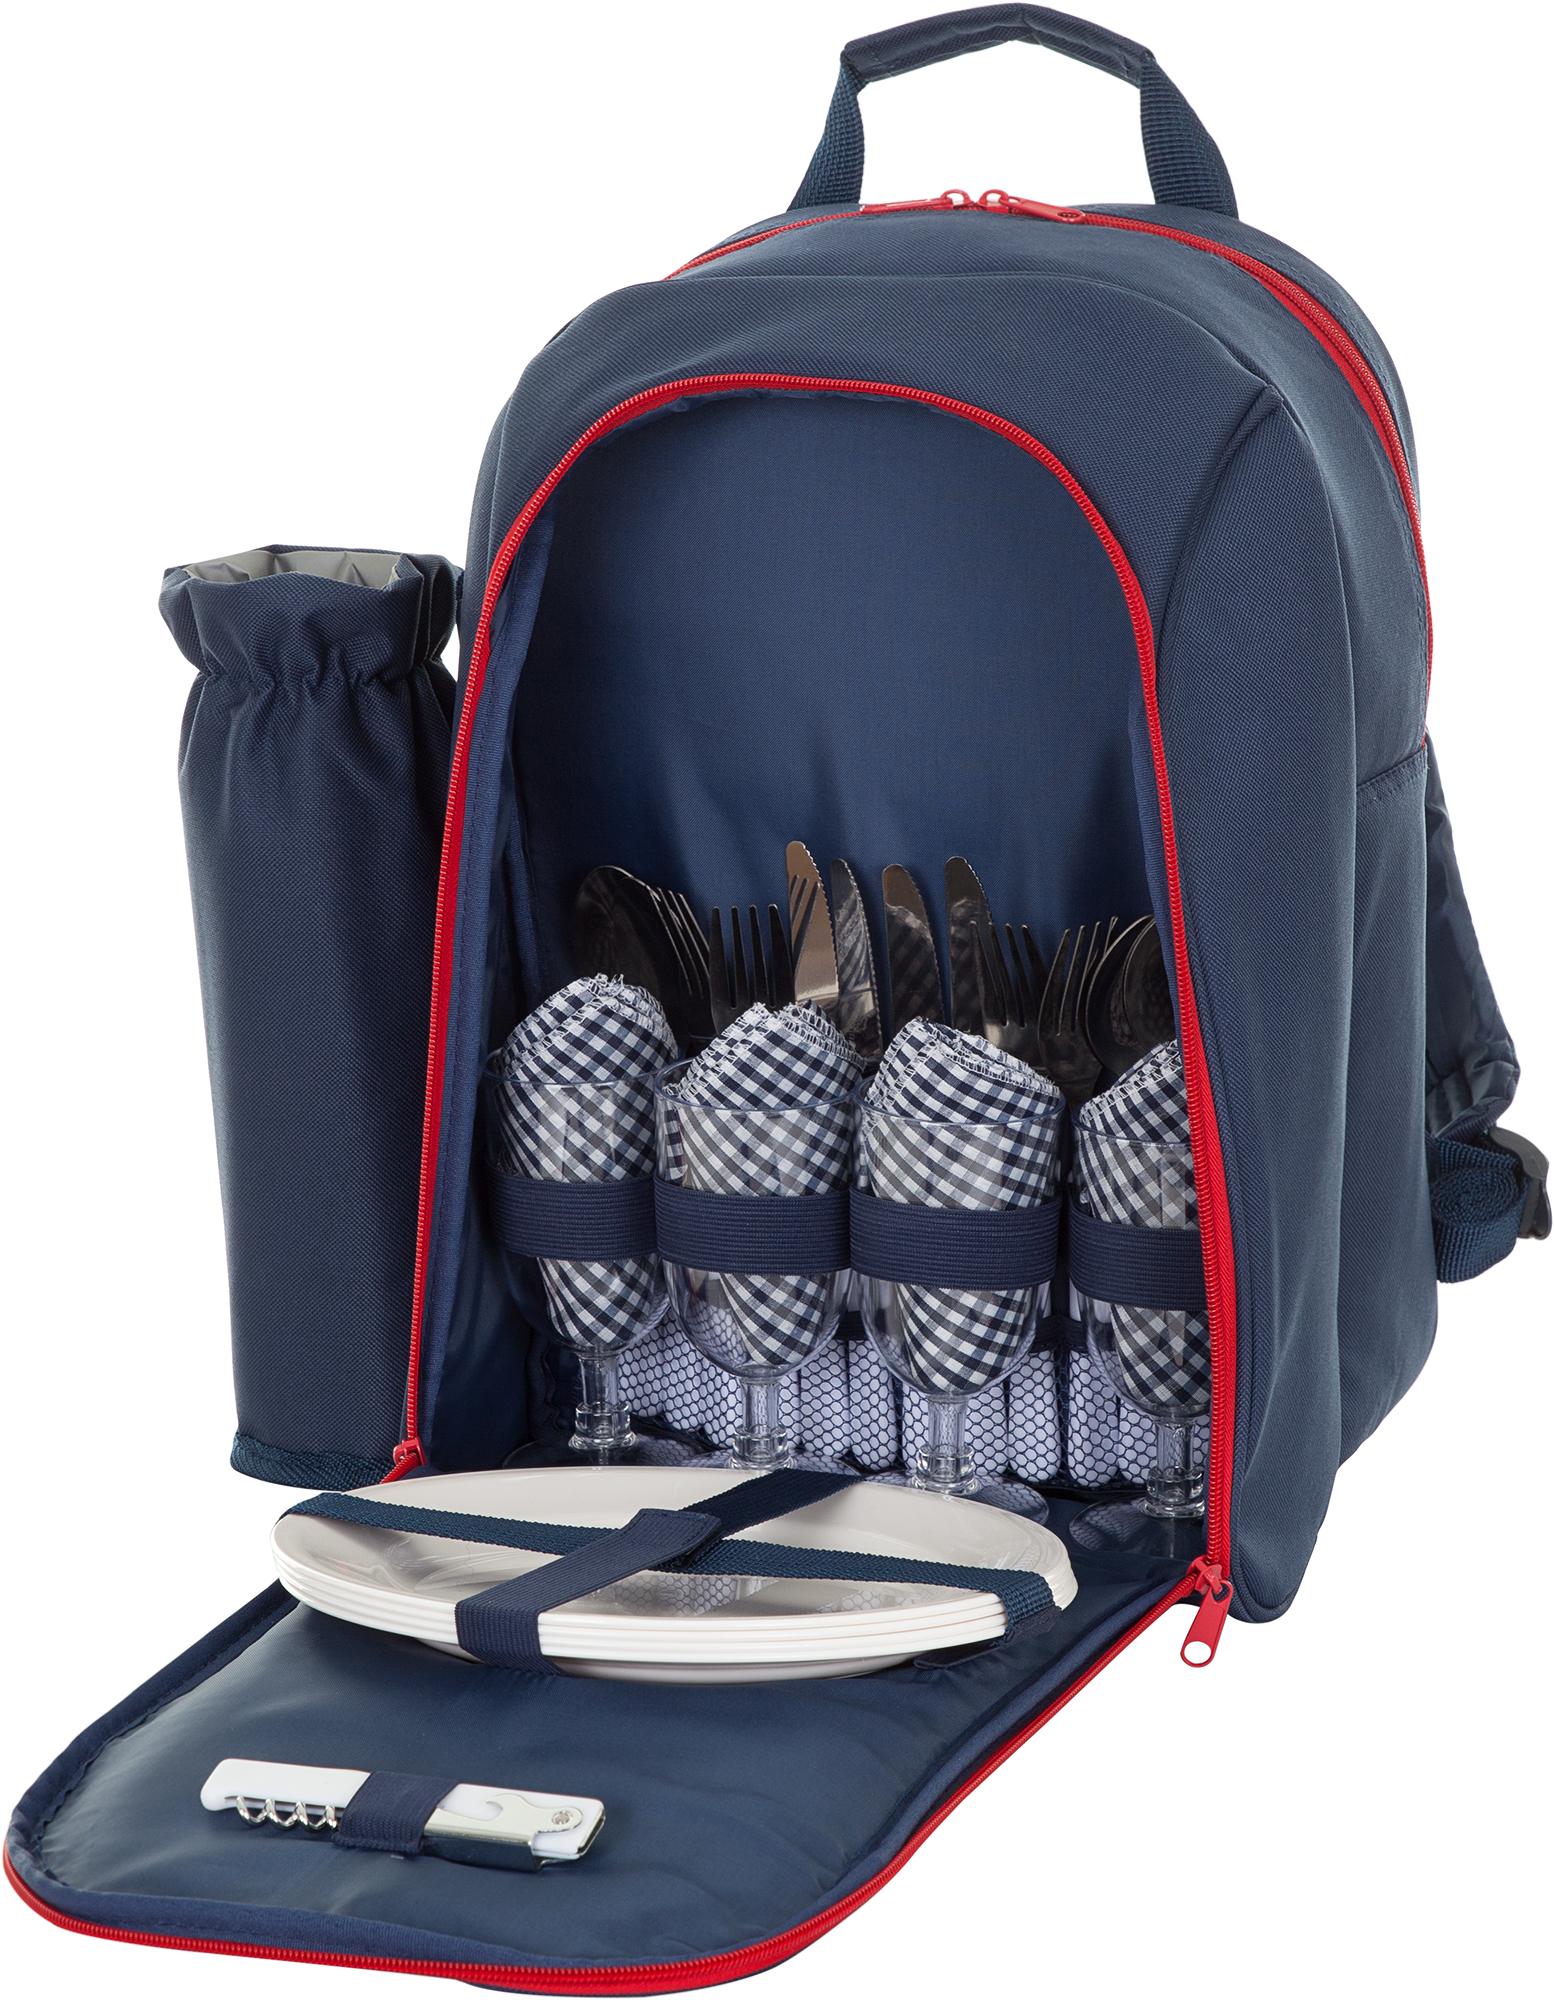 Outventure Пикниковый рюкзак Outventure на 4 человека outventure outventure twin sky 4 basic